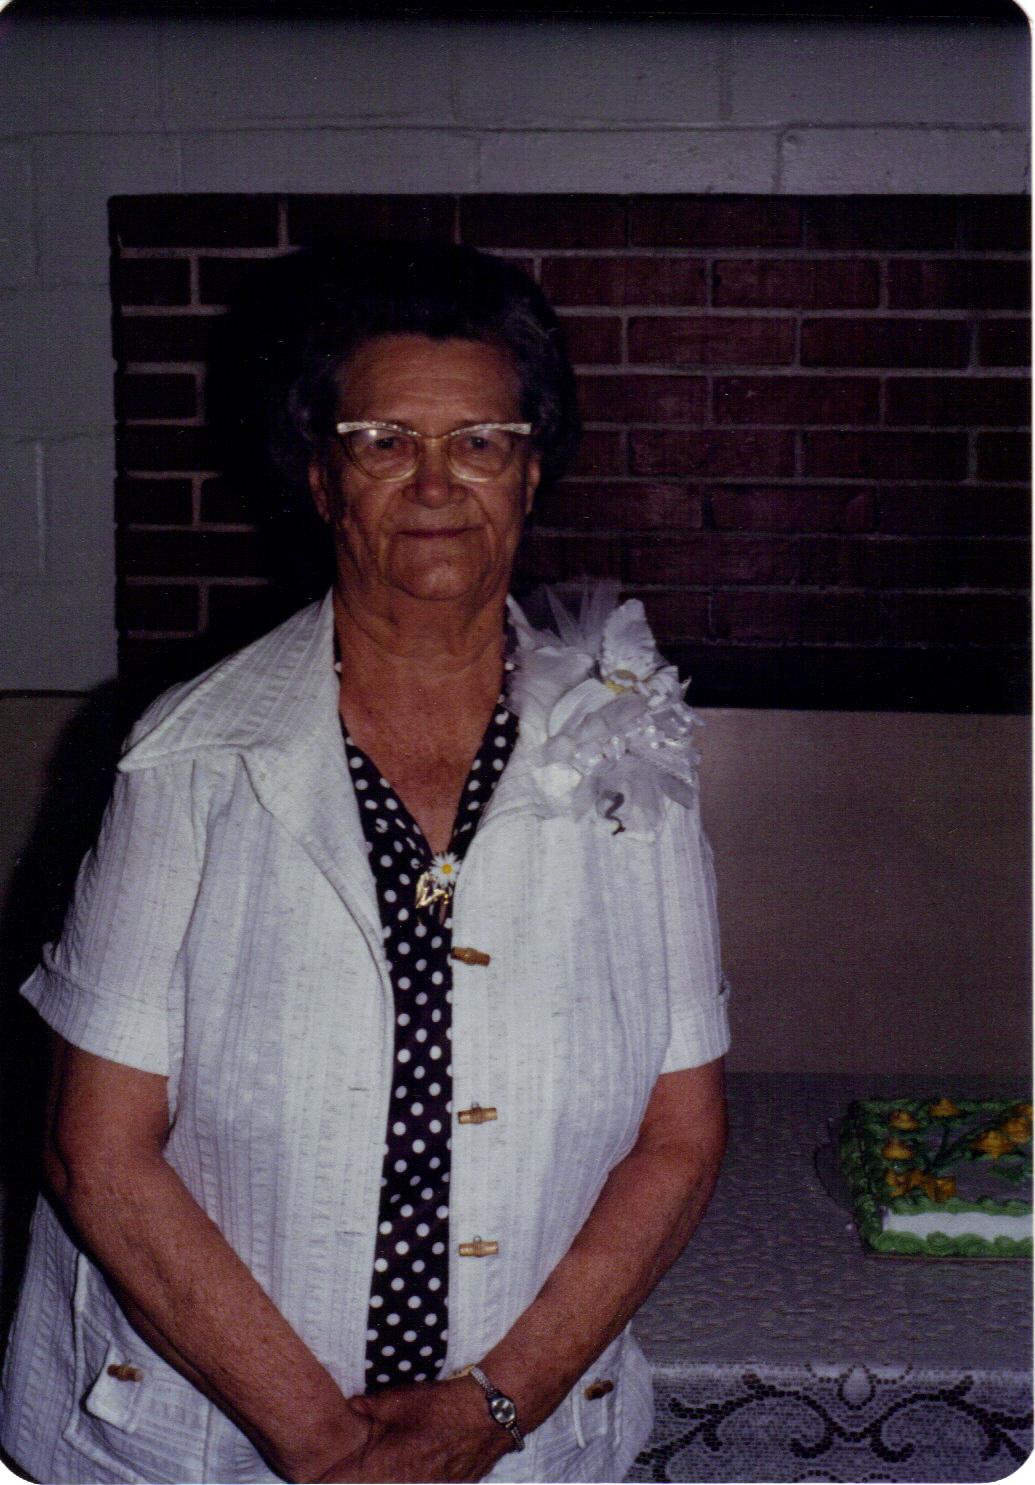 Grandma on her 77th birthday in 1980